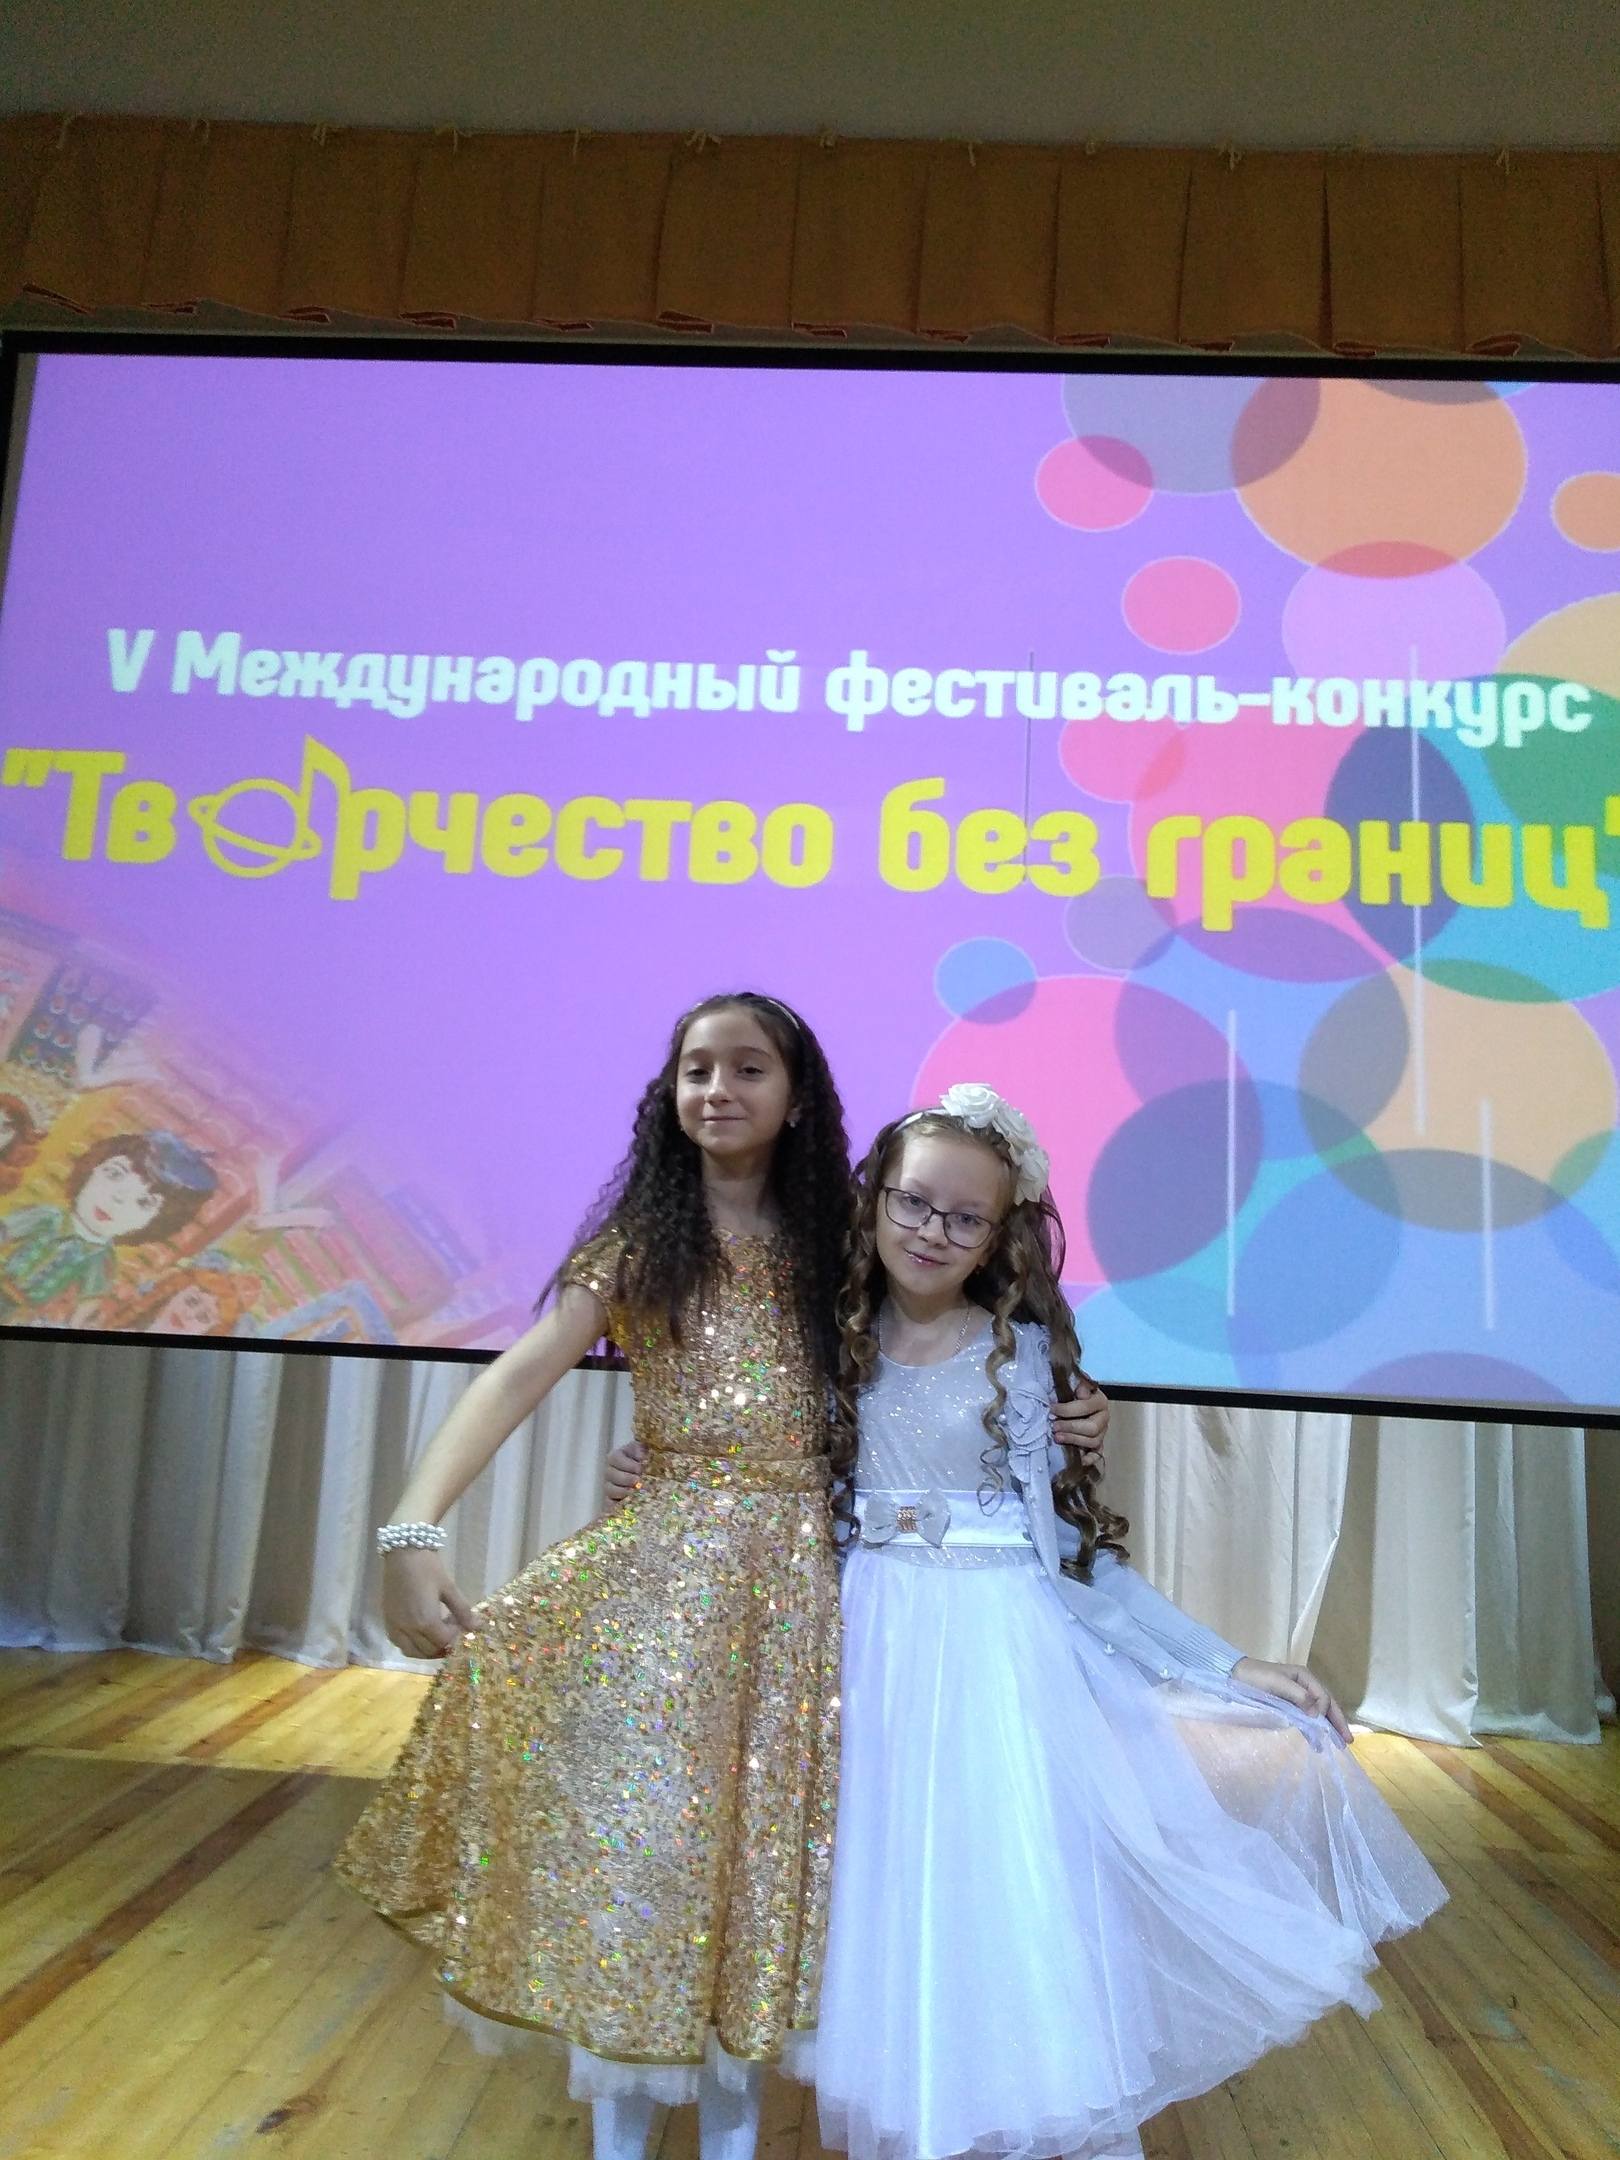 Международный фестиваль–конкурс «Творчество без границ»